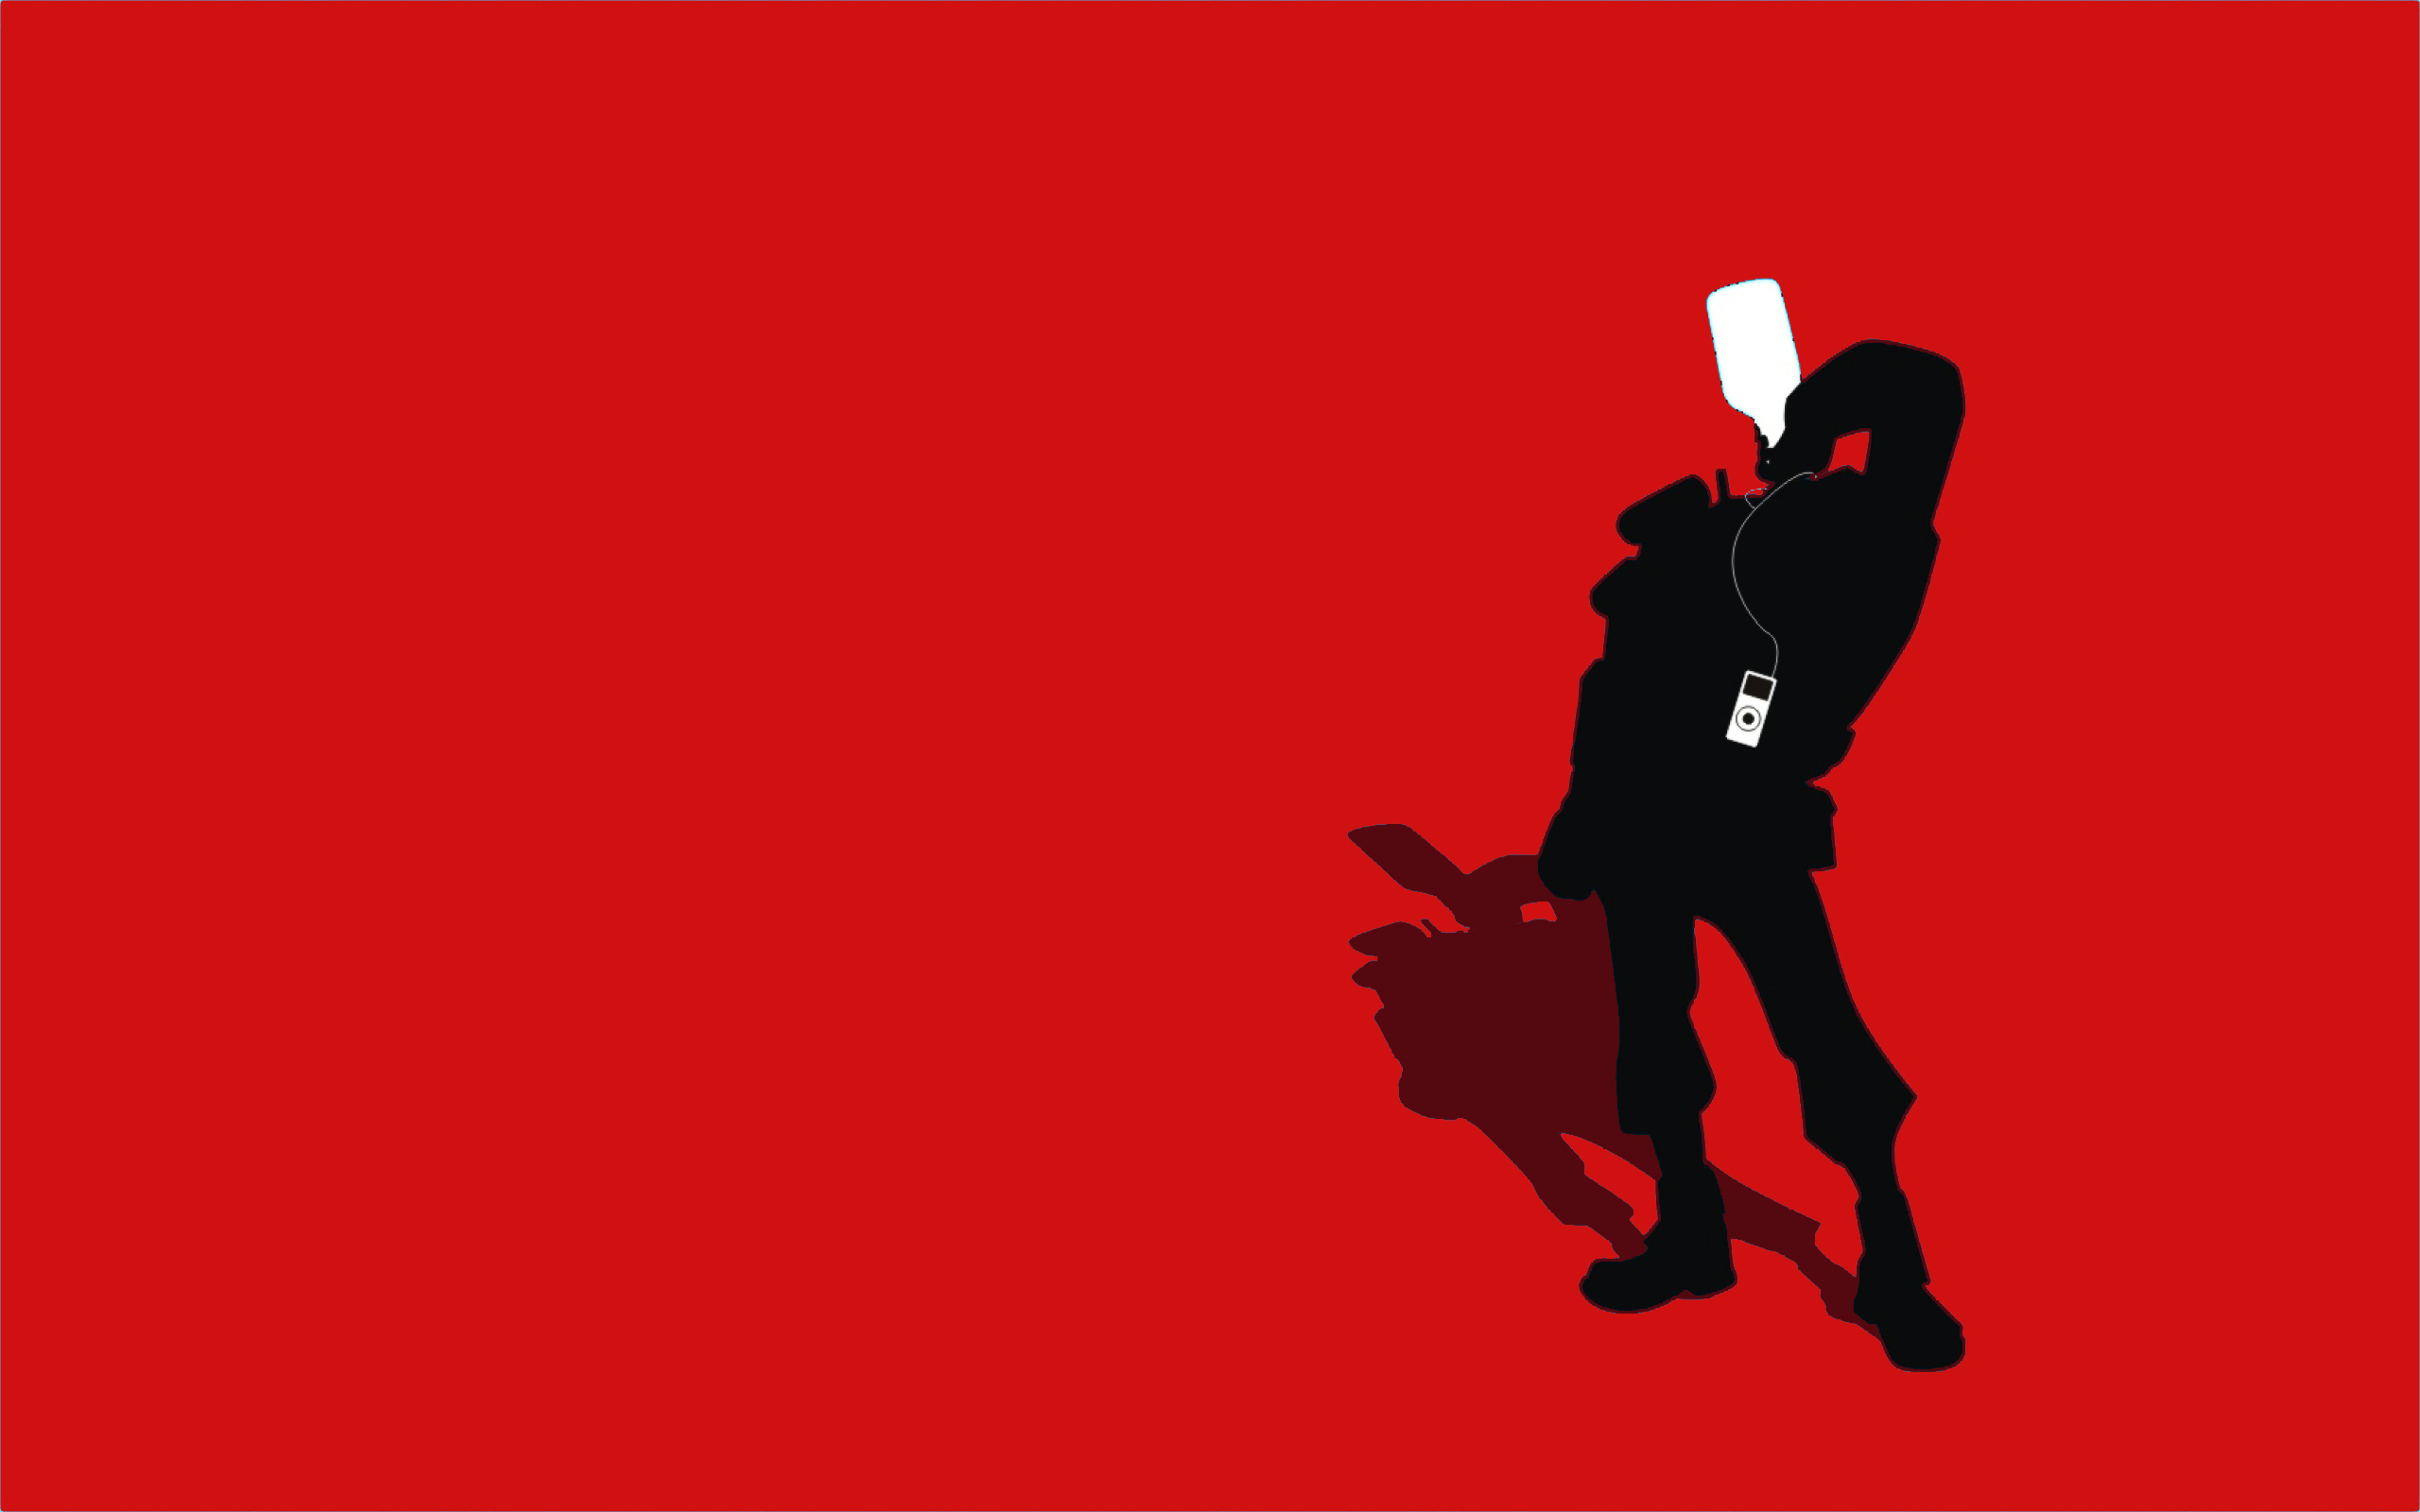 2560x1600 Tf2 Red Demoman Silhouette Ipod Earbuds 2560x1600 By Cwegrecki